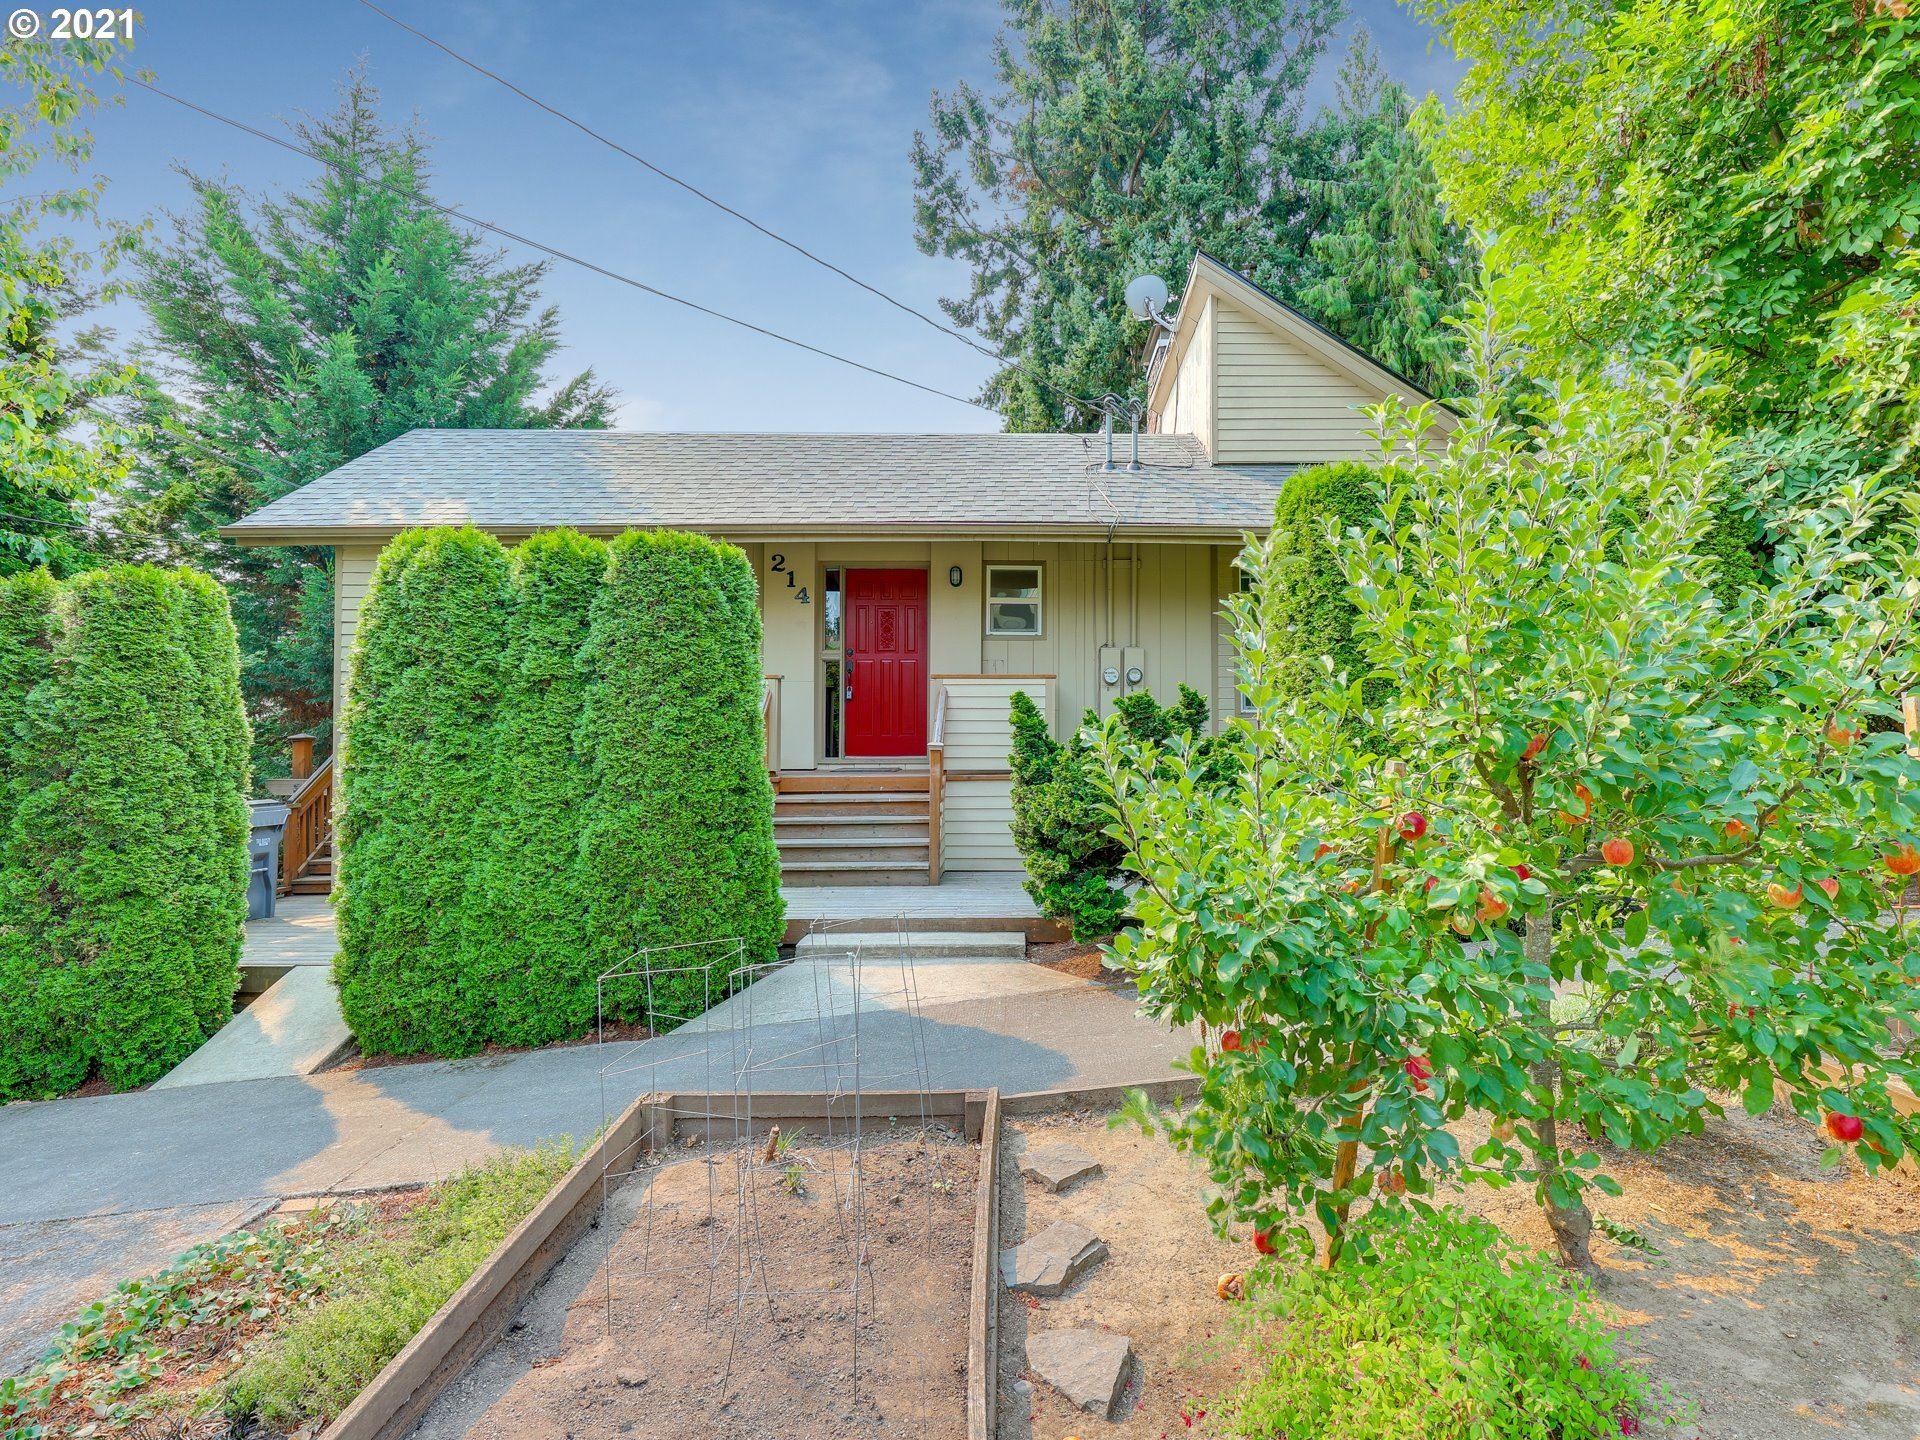 214 SW HAMILTON ST, Portland, OR 97239 - MLS#: 21179002